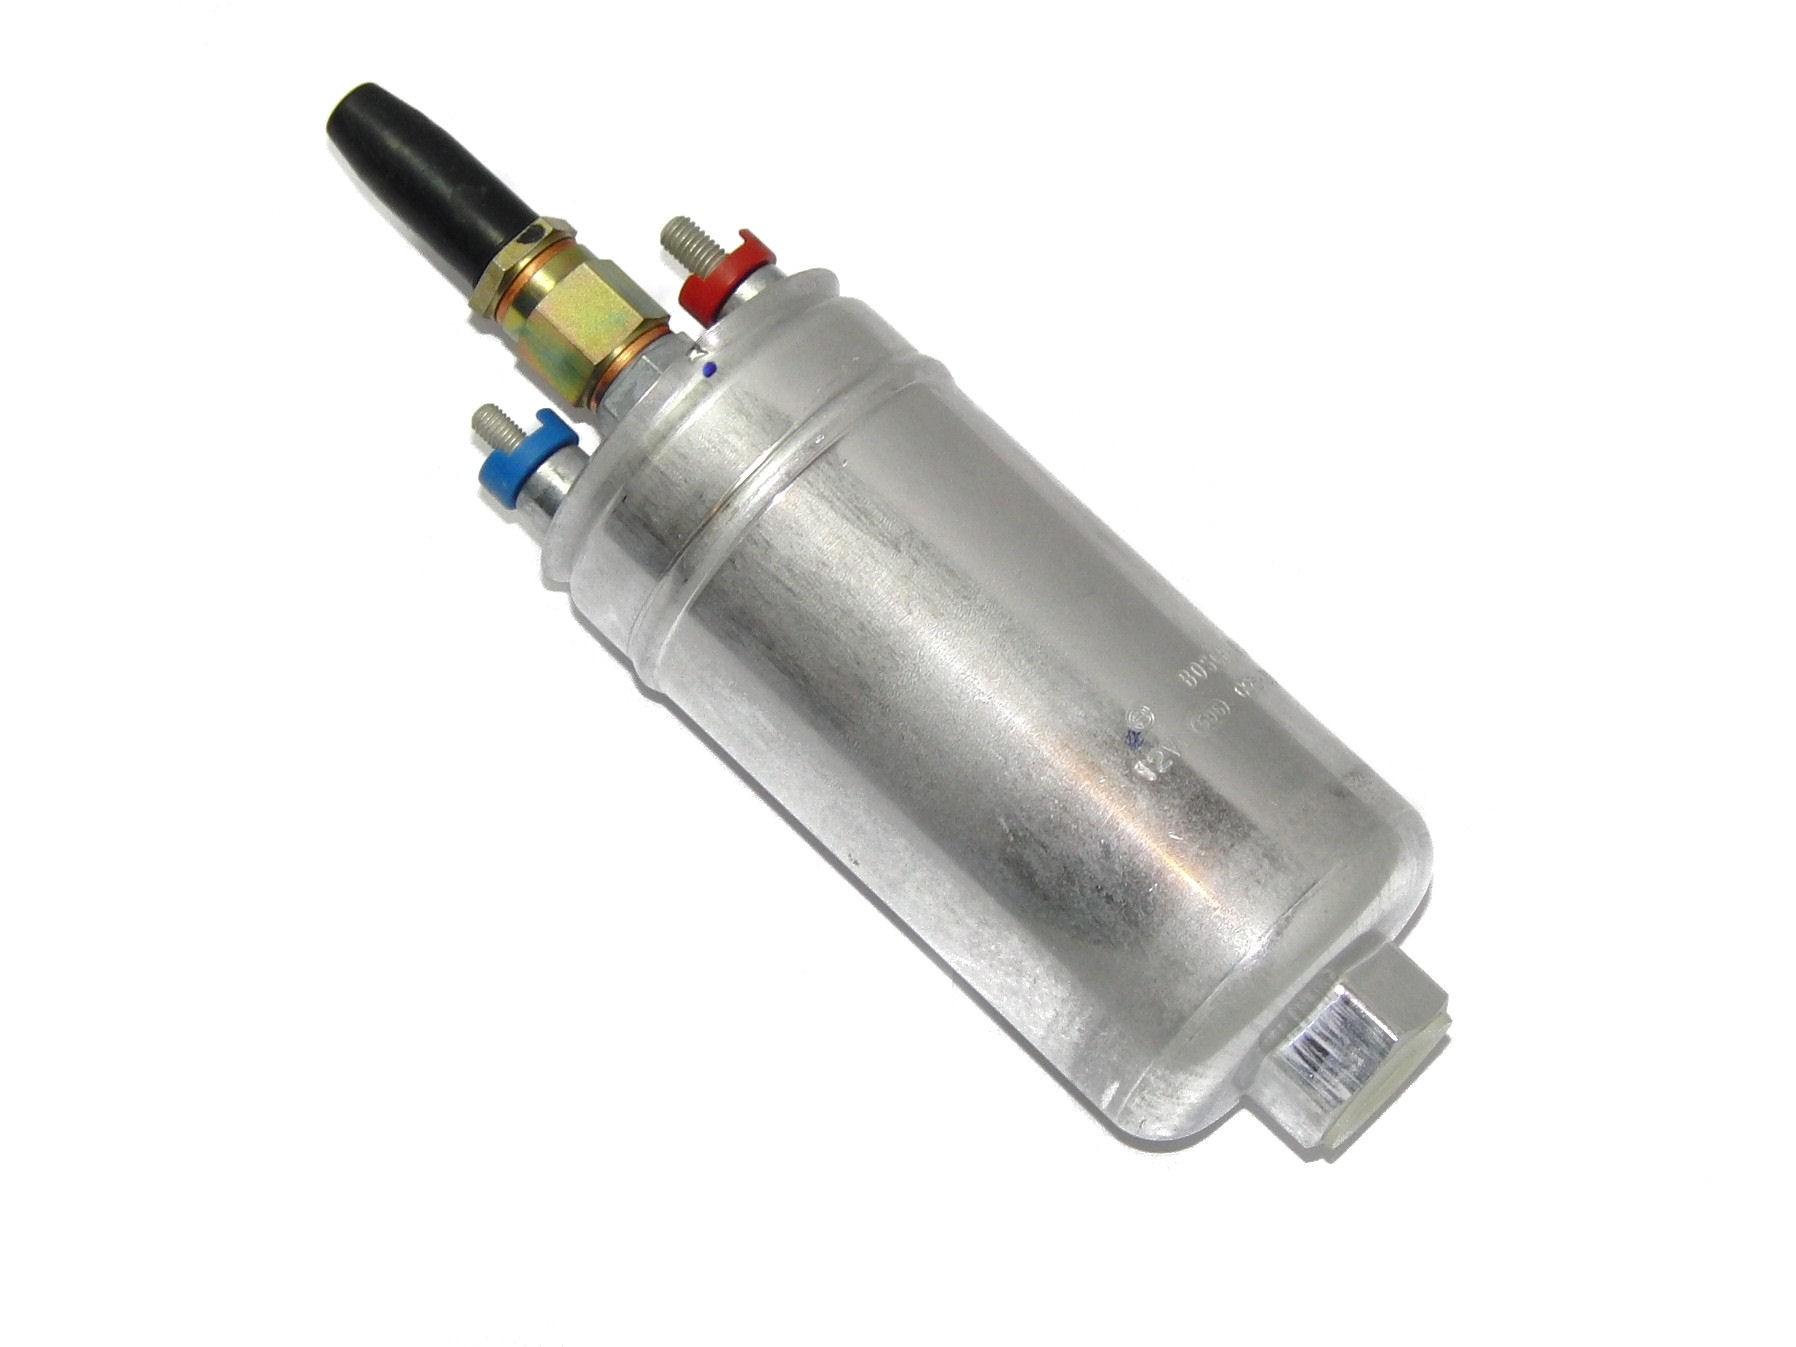 Bosch 044 High Performance Fuel Injection Pump